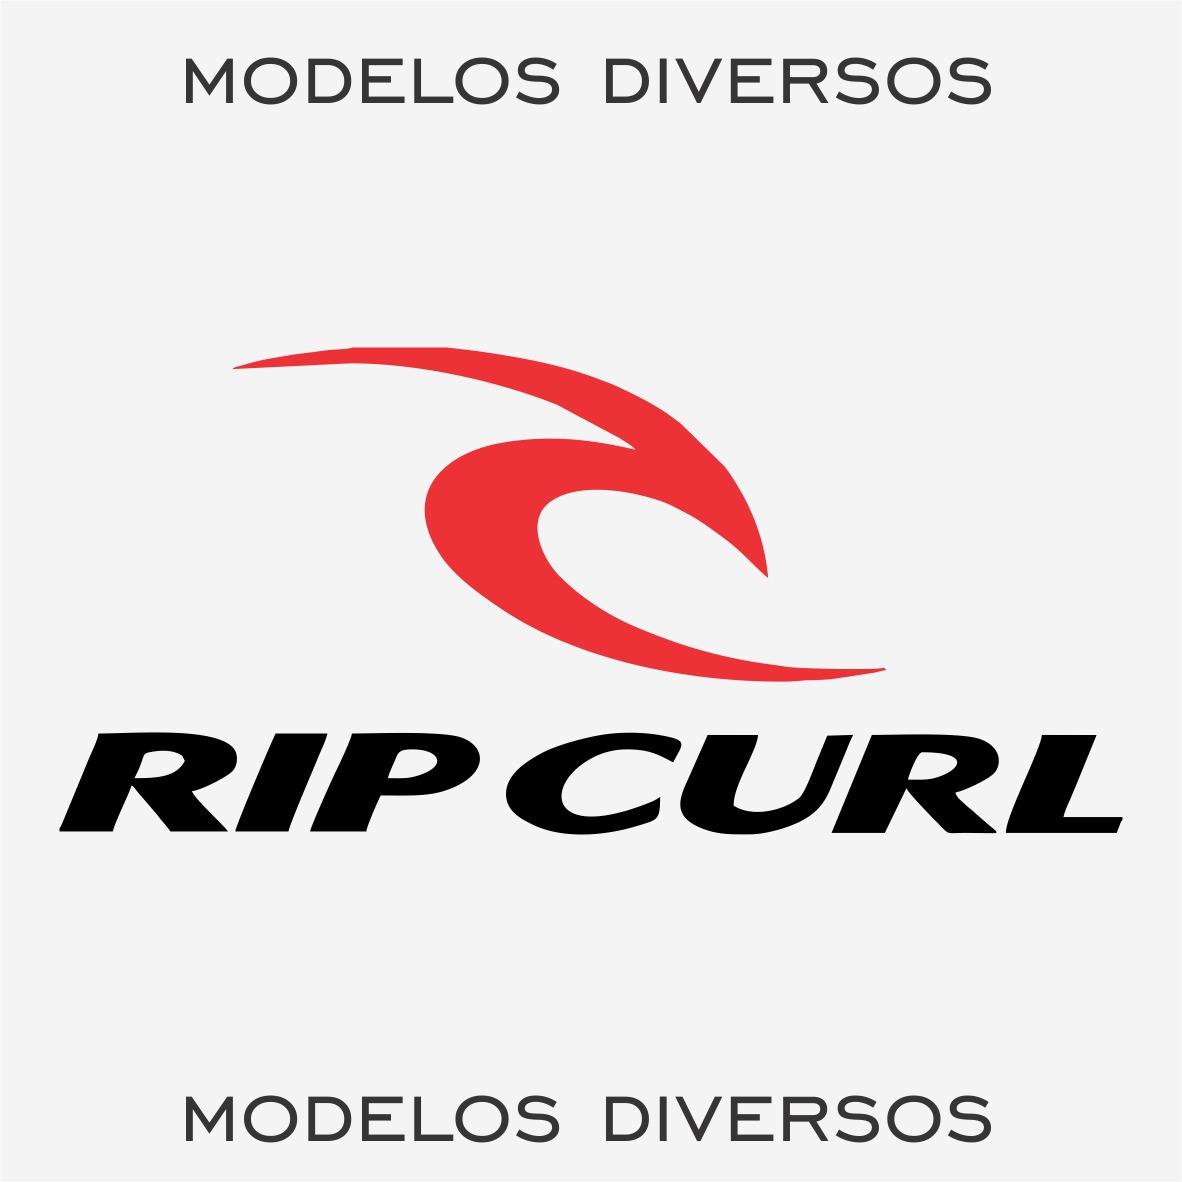 Kit 2x Adesivo Rip Curl Marcas Famosas Roupas Surf 22cm A626 - R  11 ... f9696654536